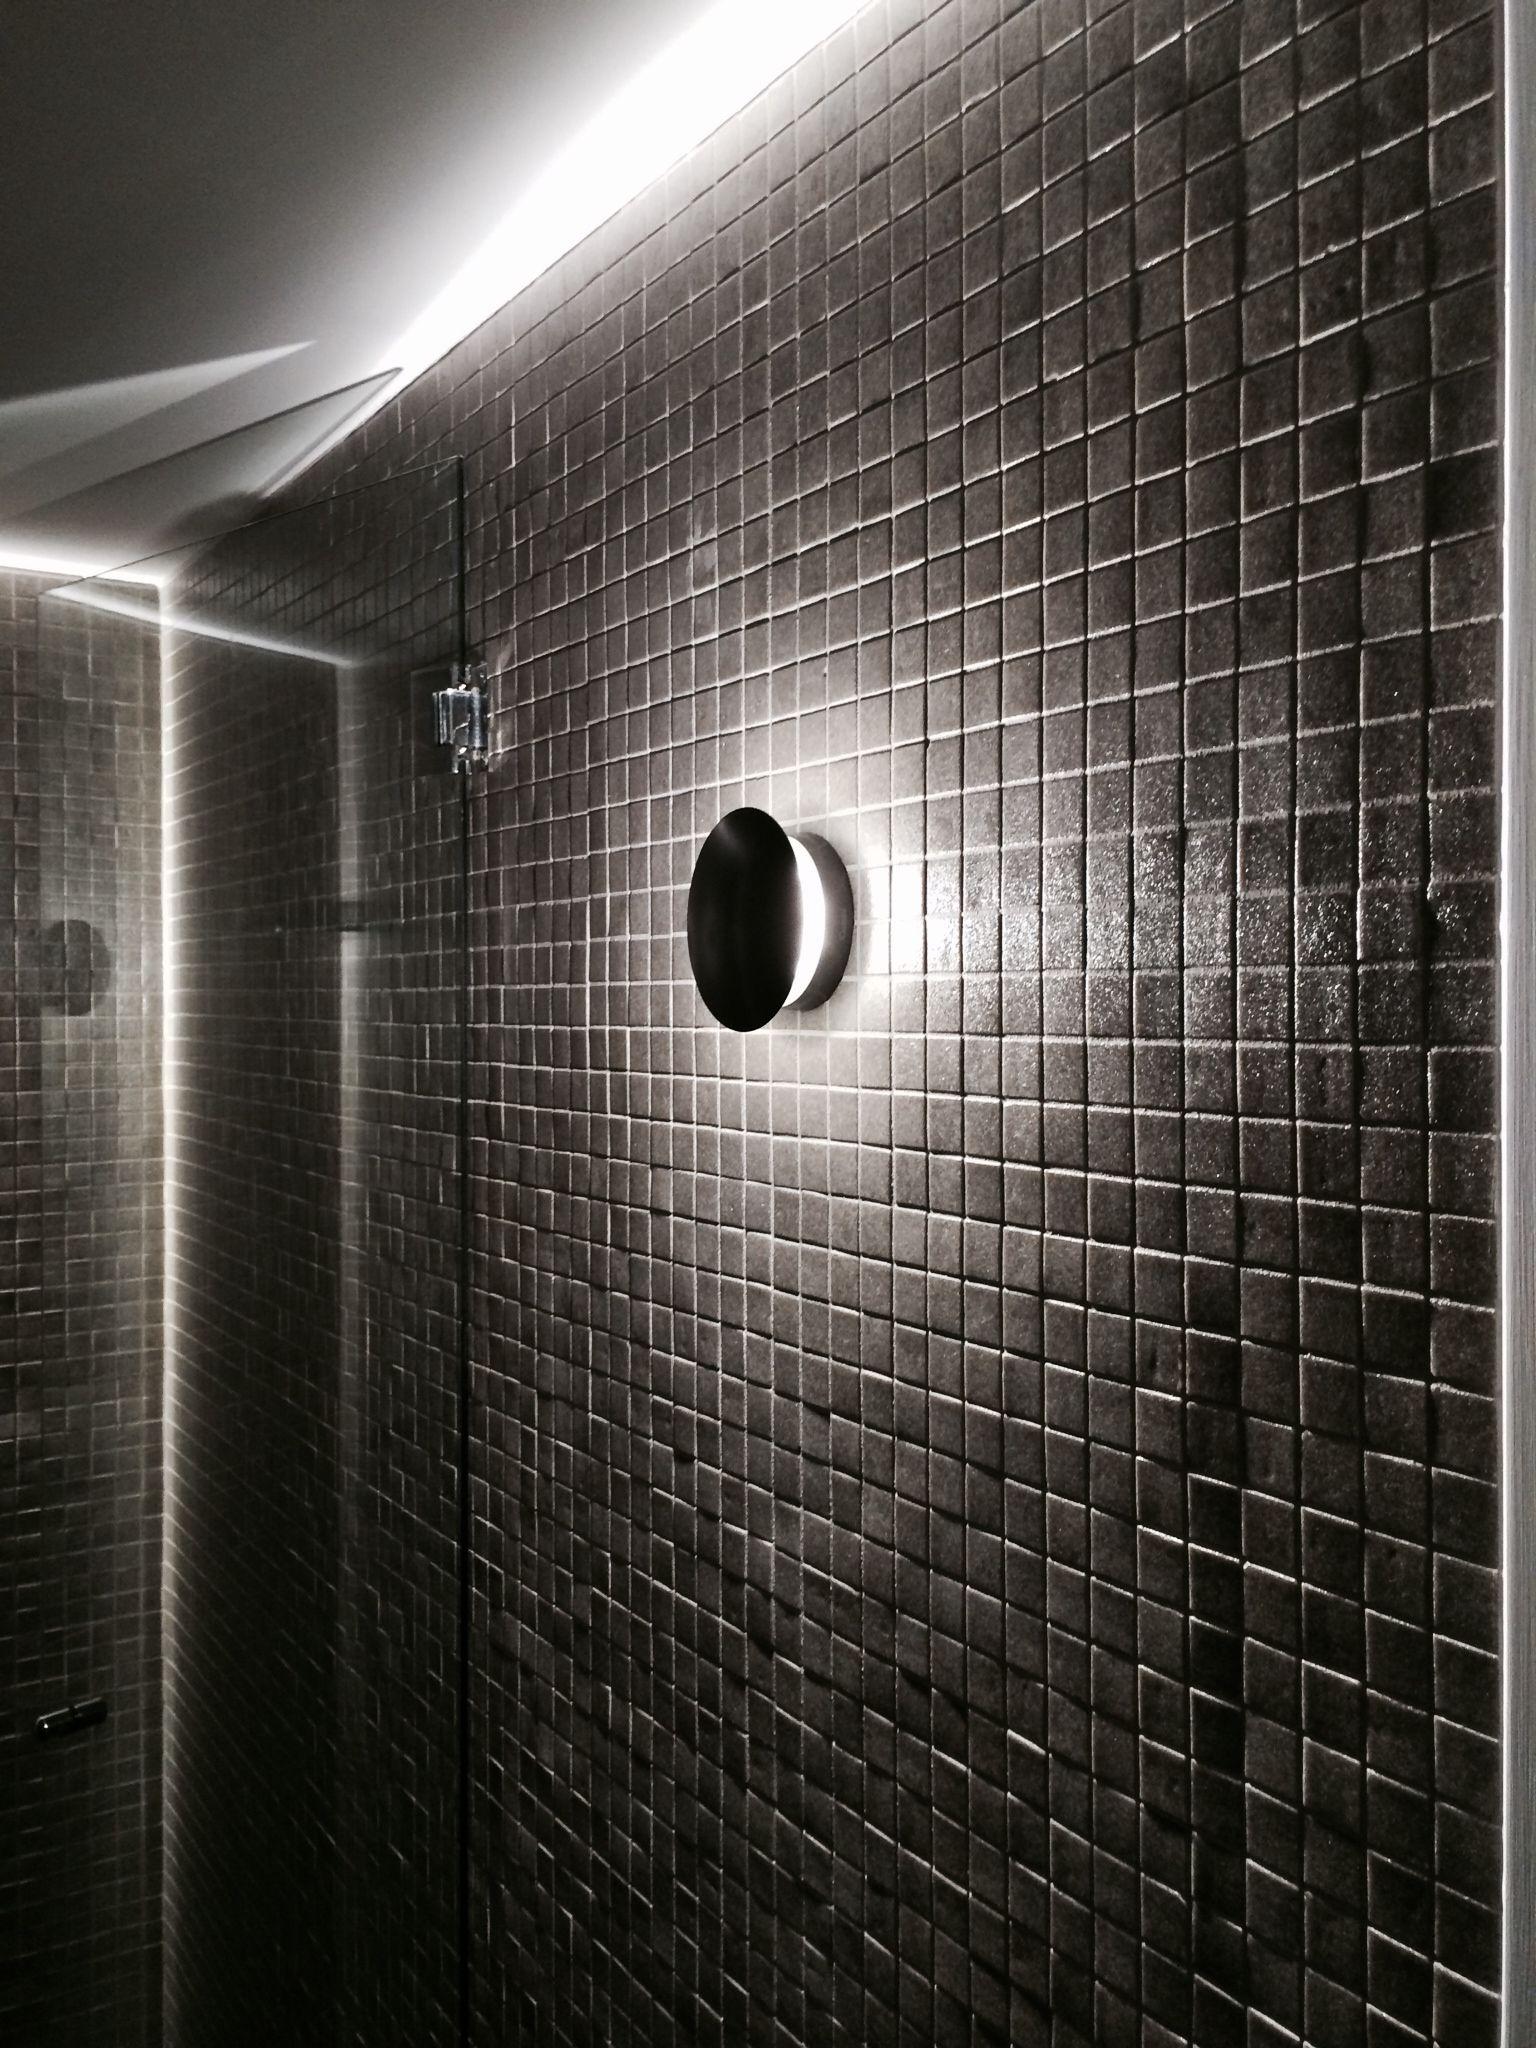 iguzzini trick and underscore installation iguzzini sydney. Black Bedroom Furniture Sets. Home Design Ideas